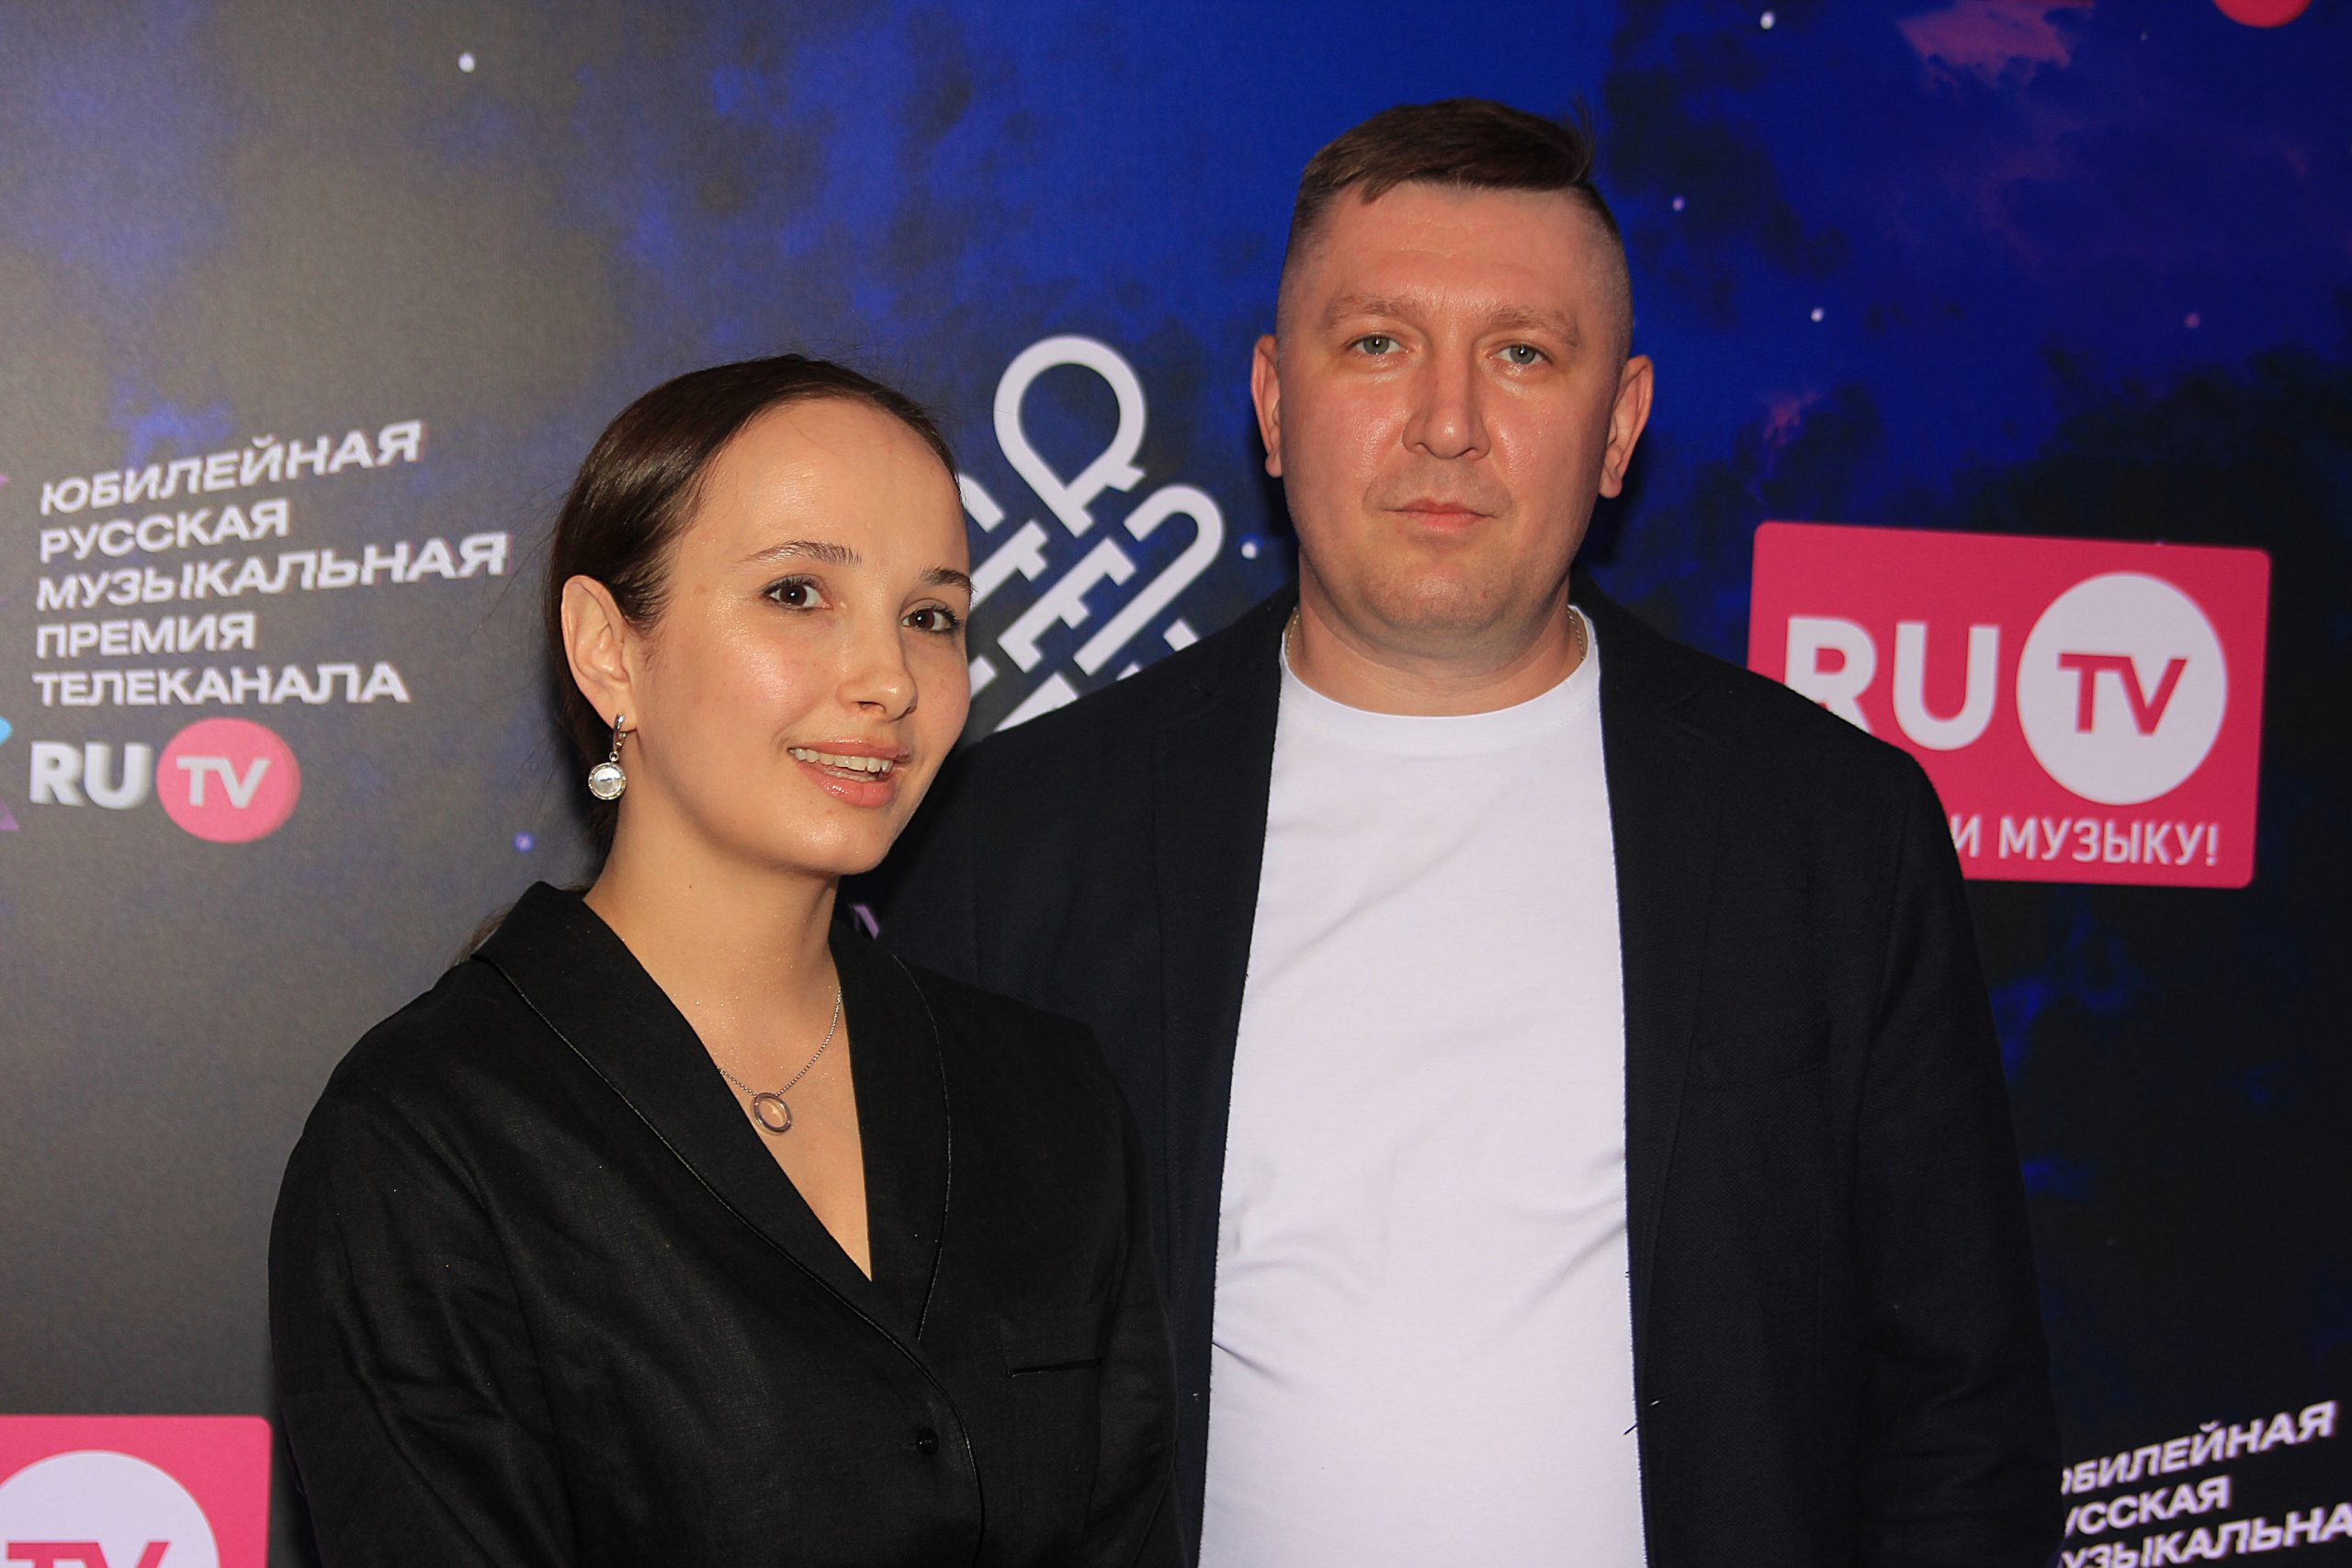 X Музыкальная премия телеканала RU.TV (фоторепортаж)